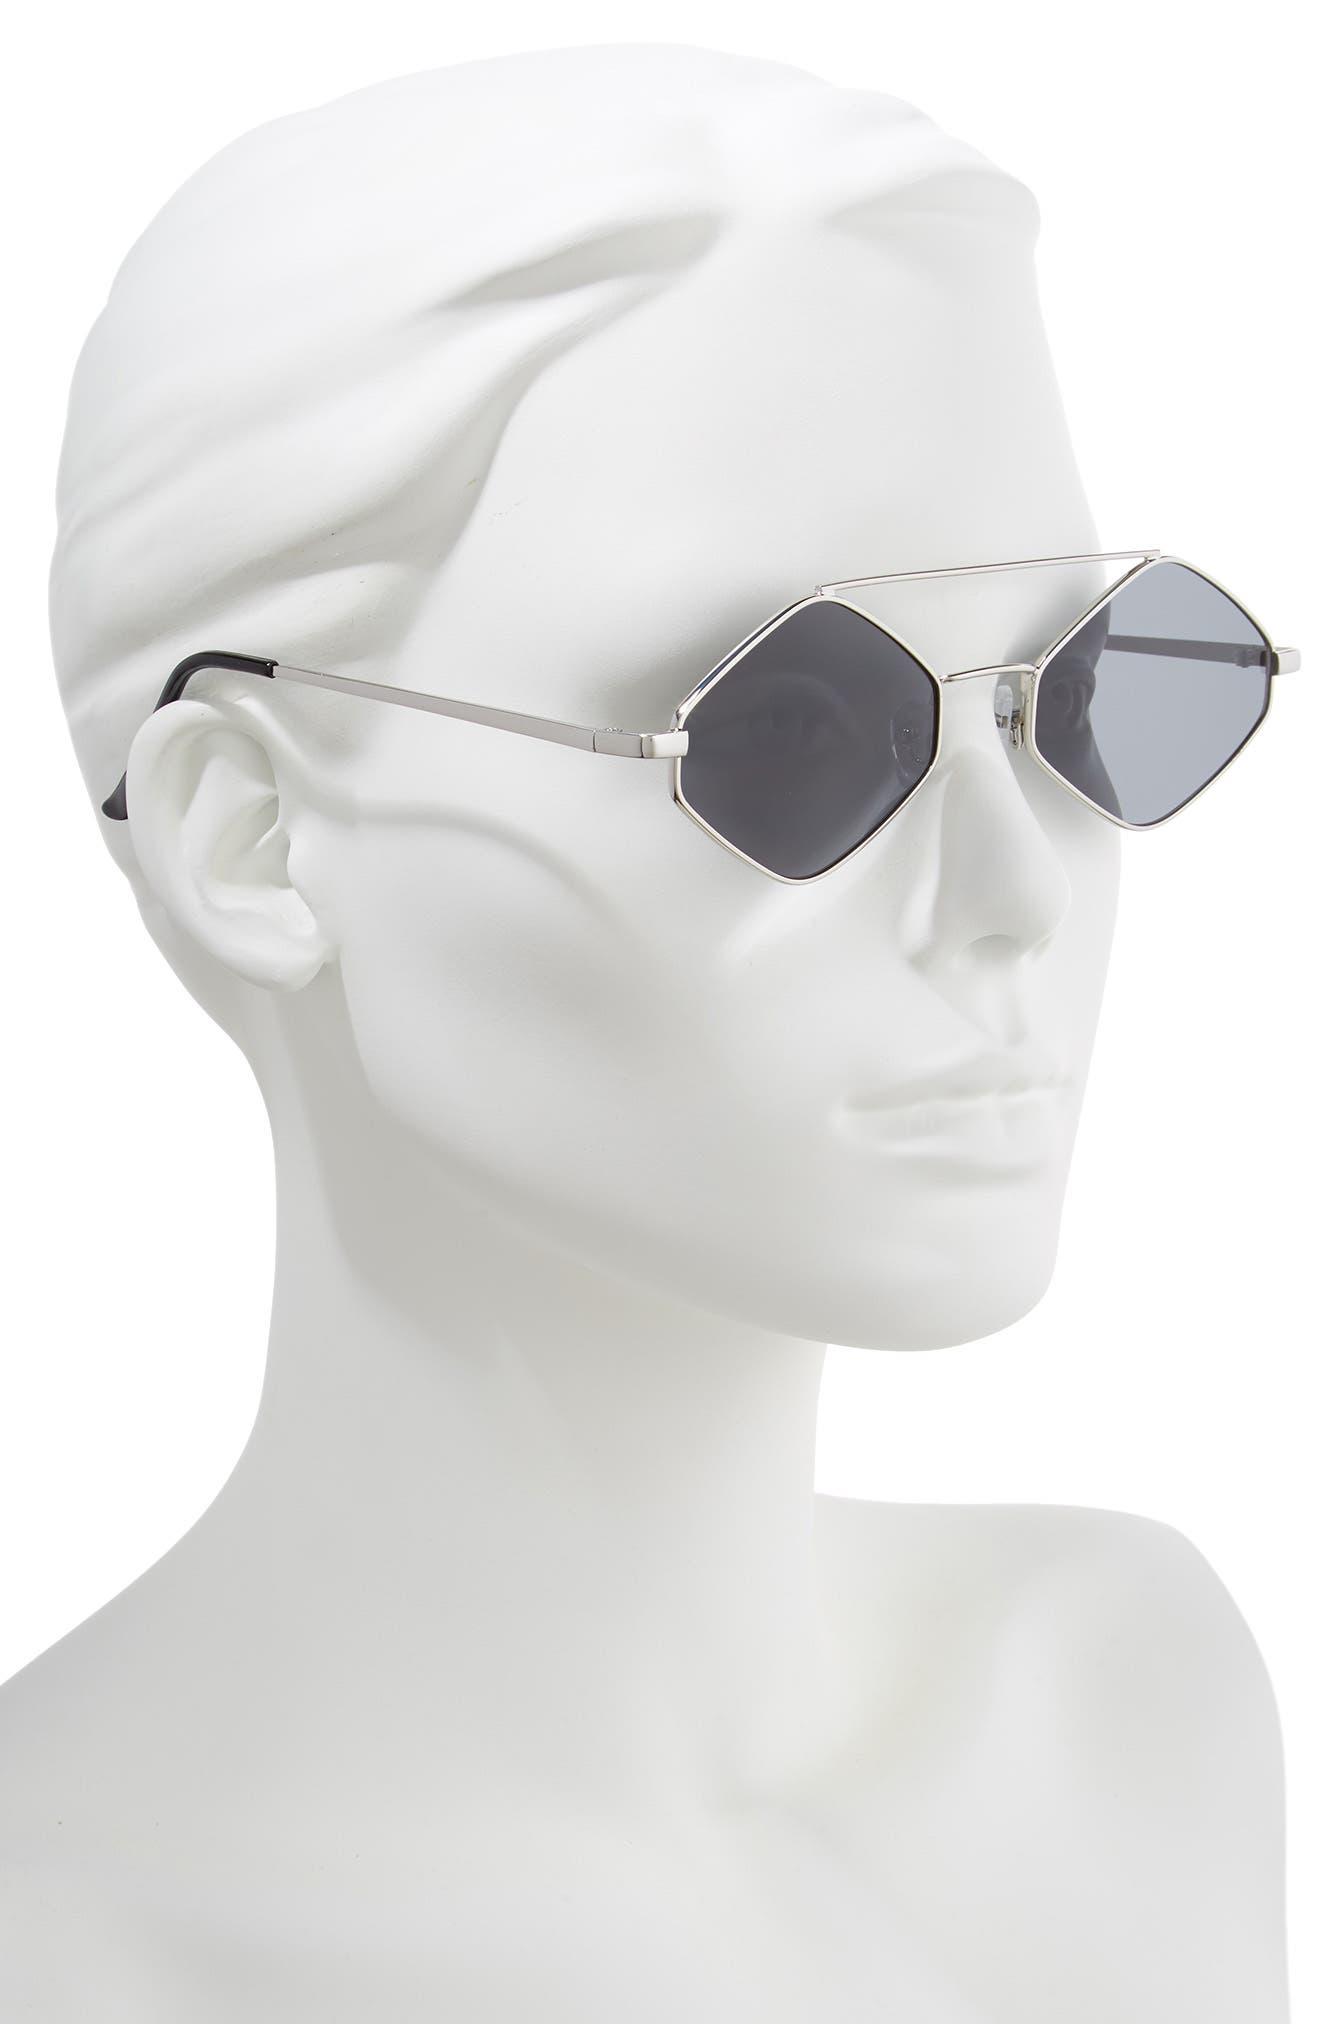 55mm Brow Bar Geometric Sunglasses,                             Alternate thumbnail 2, color,                             040